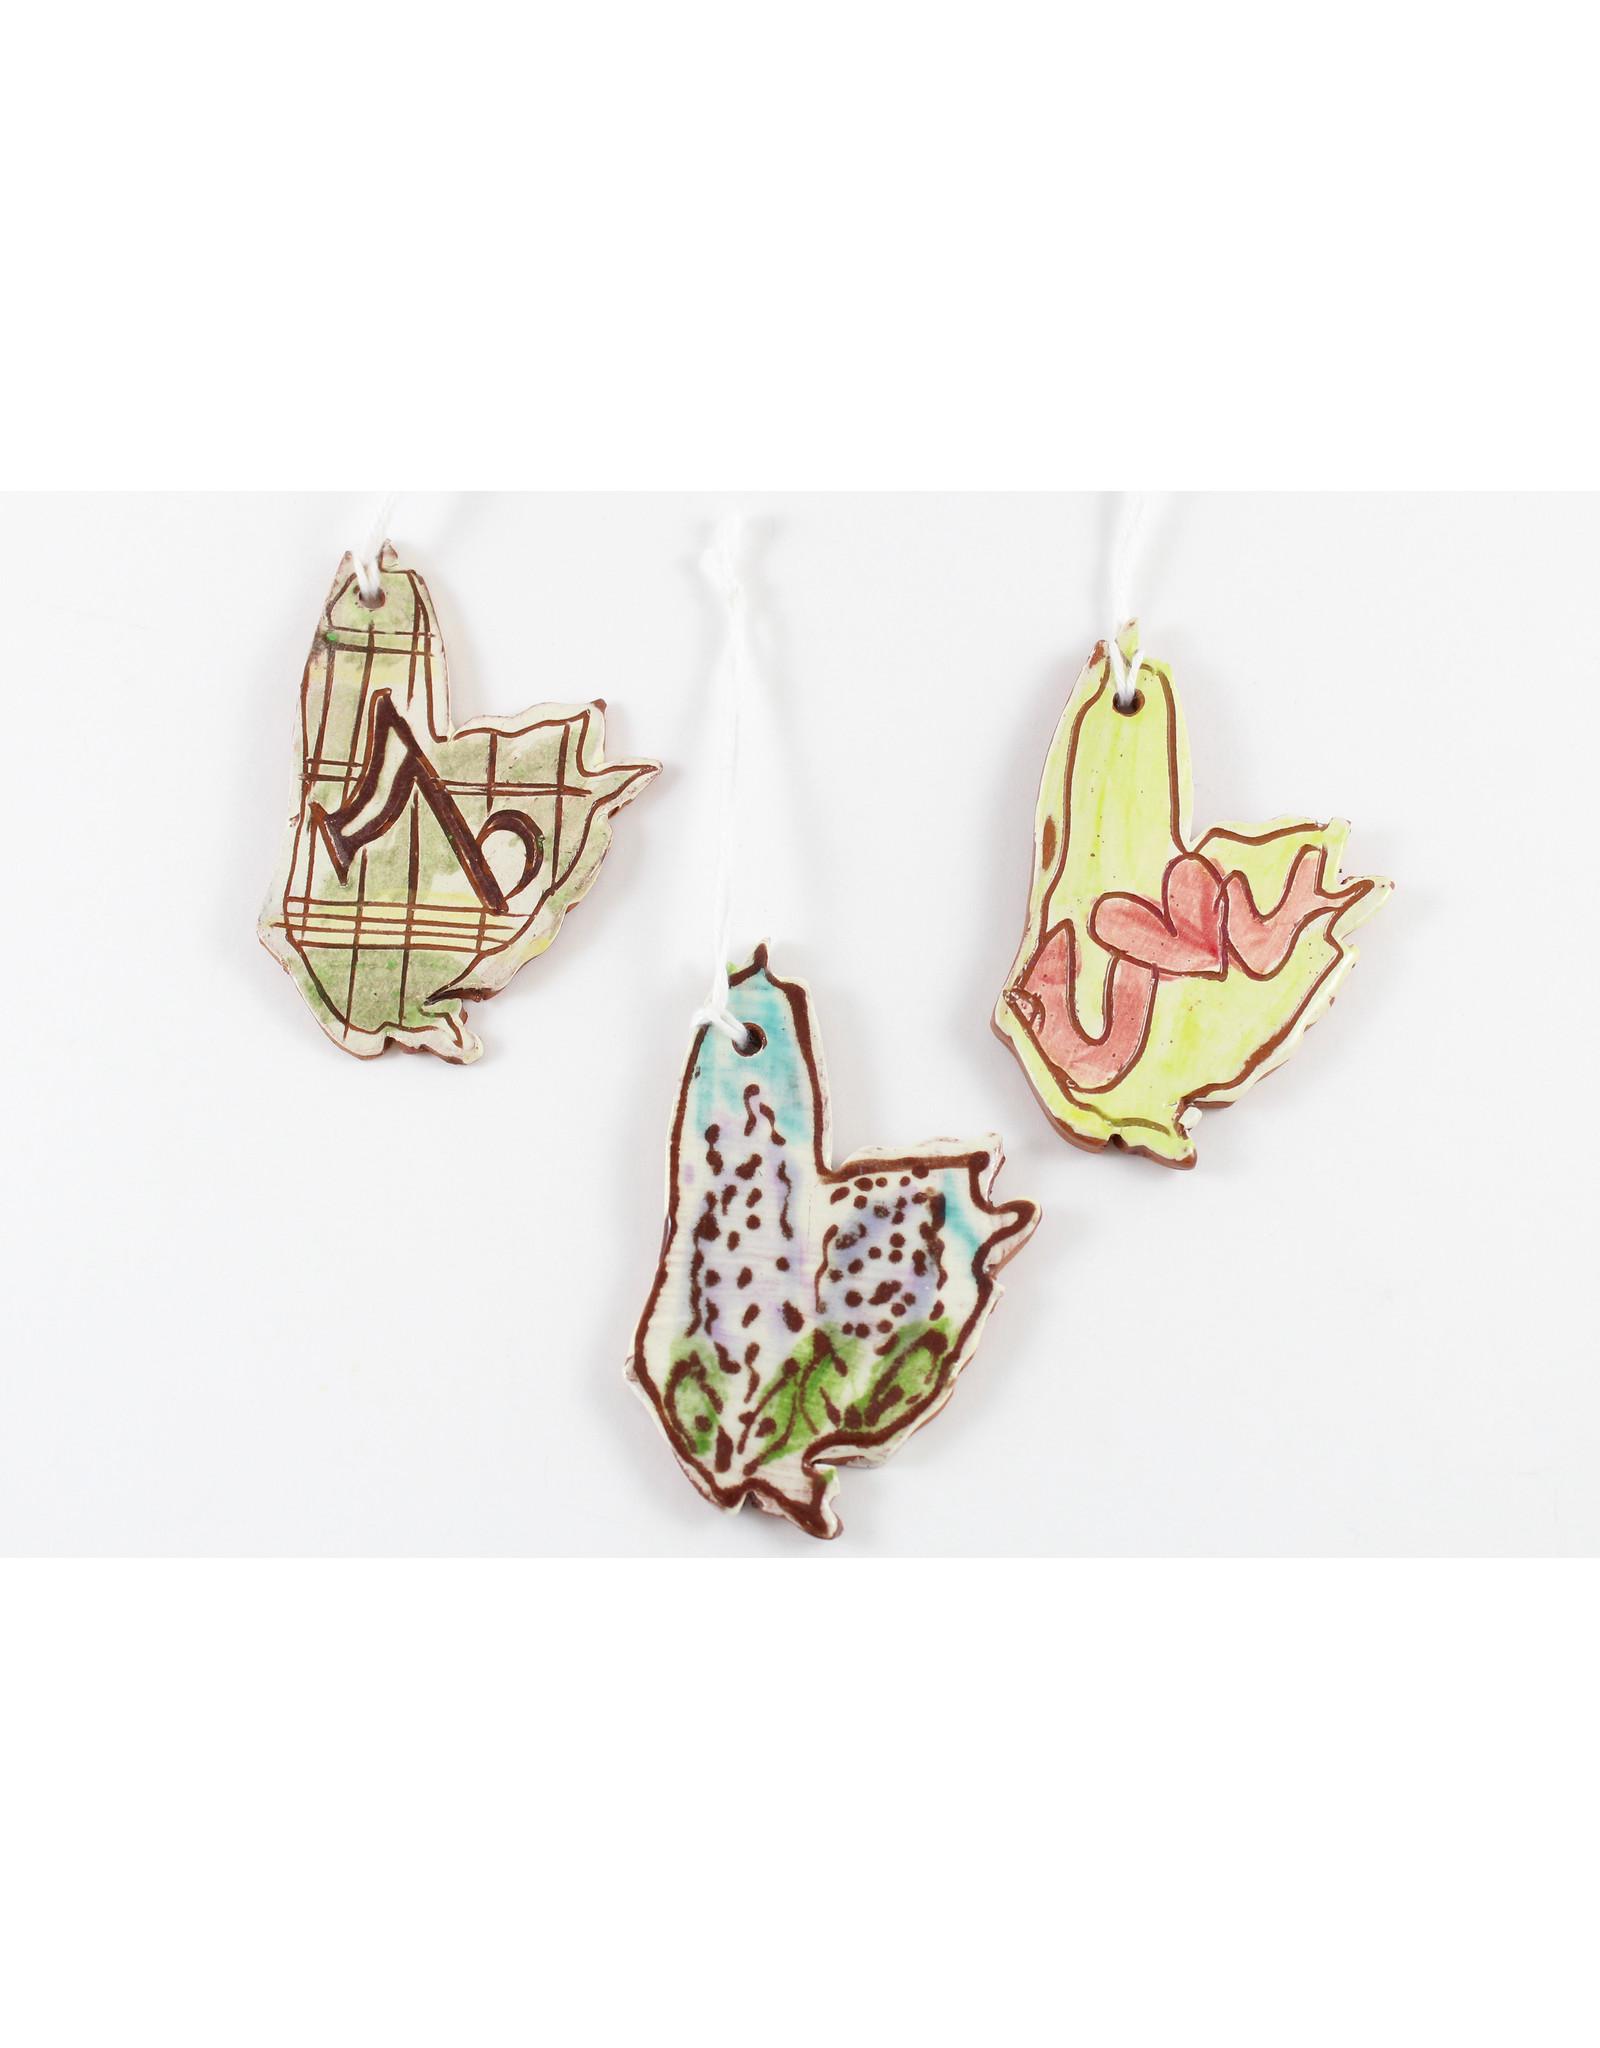 Victoria Bonin-MacKenzie Cape Breton Island Ornaments by Victoria Bonin-MacKenzie